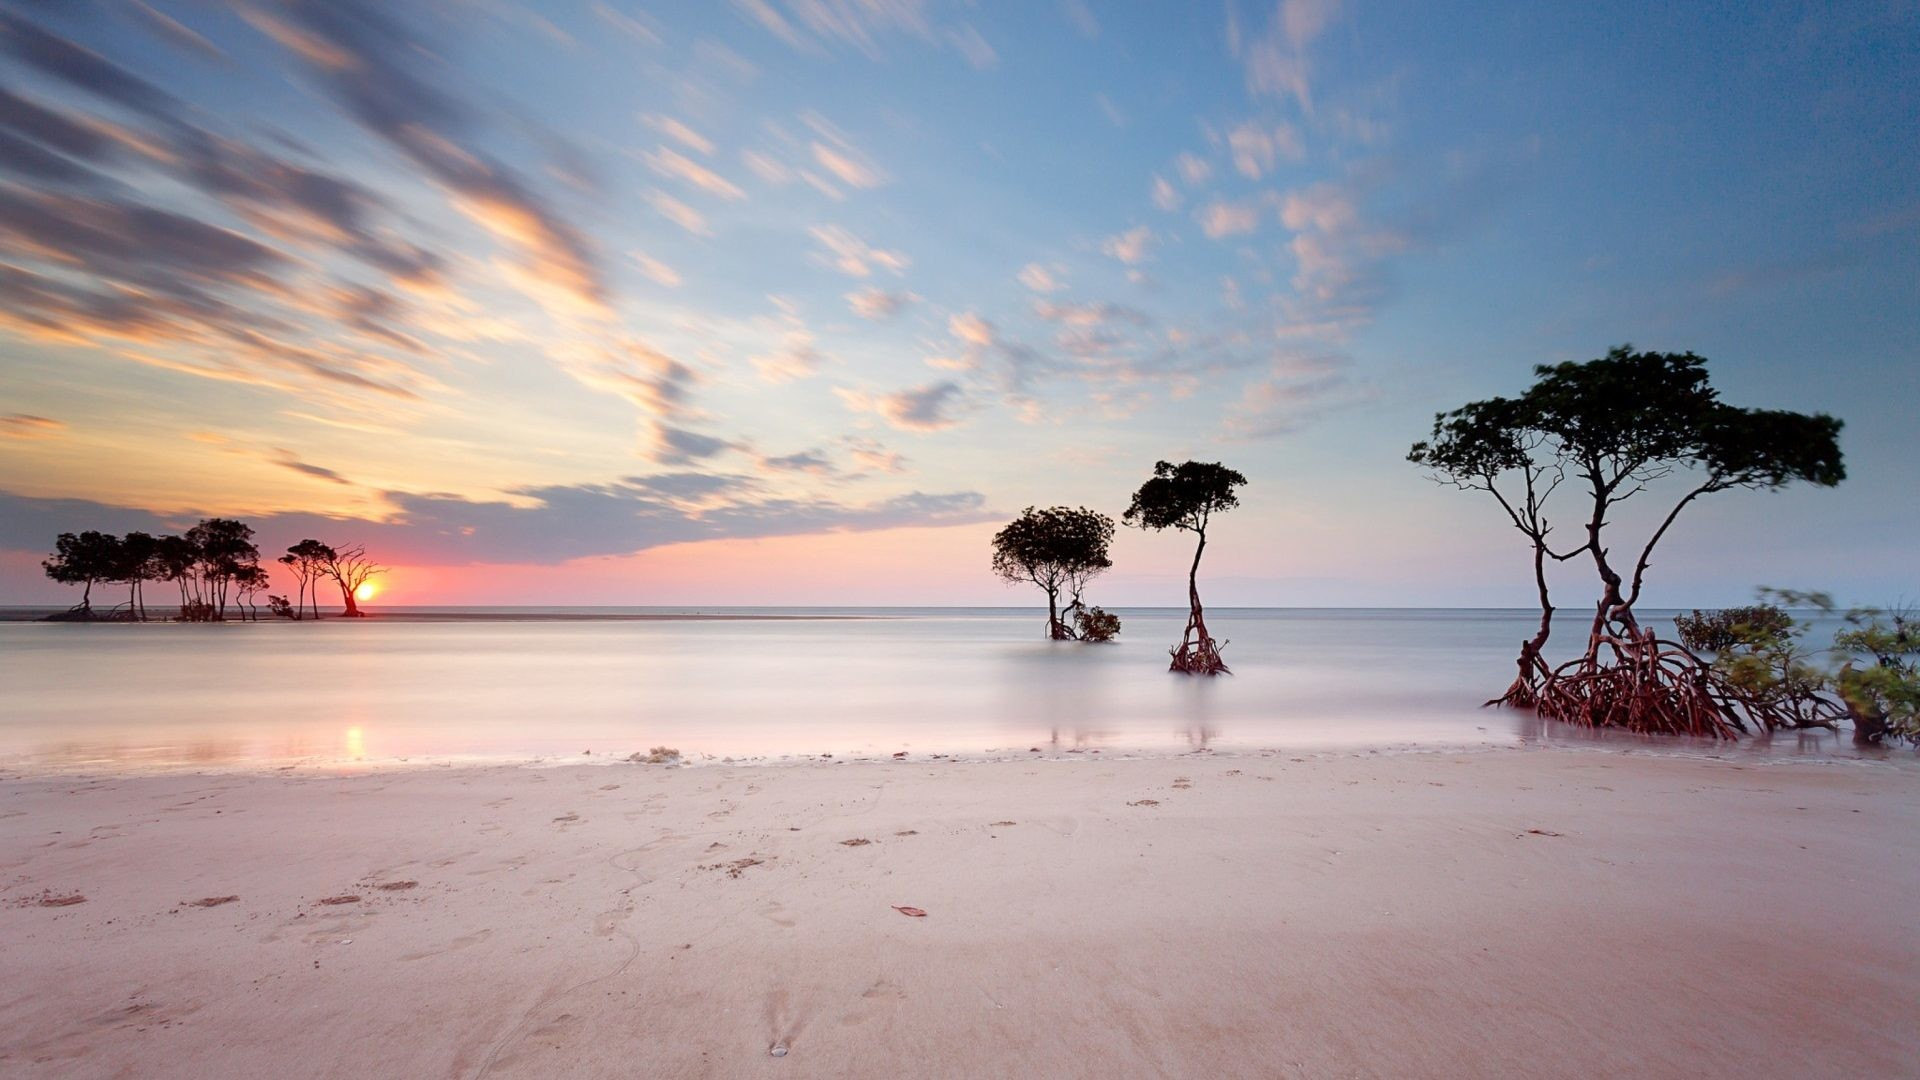 Seashore Tag – Sea Pinky Sunset Grow Shore Silhouettes Trees Seashore Beach  Live Wallpaper Free Download